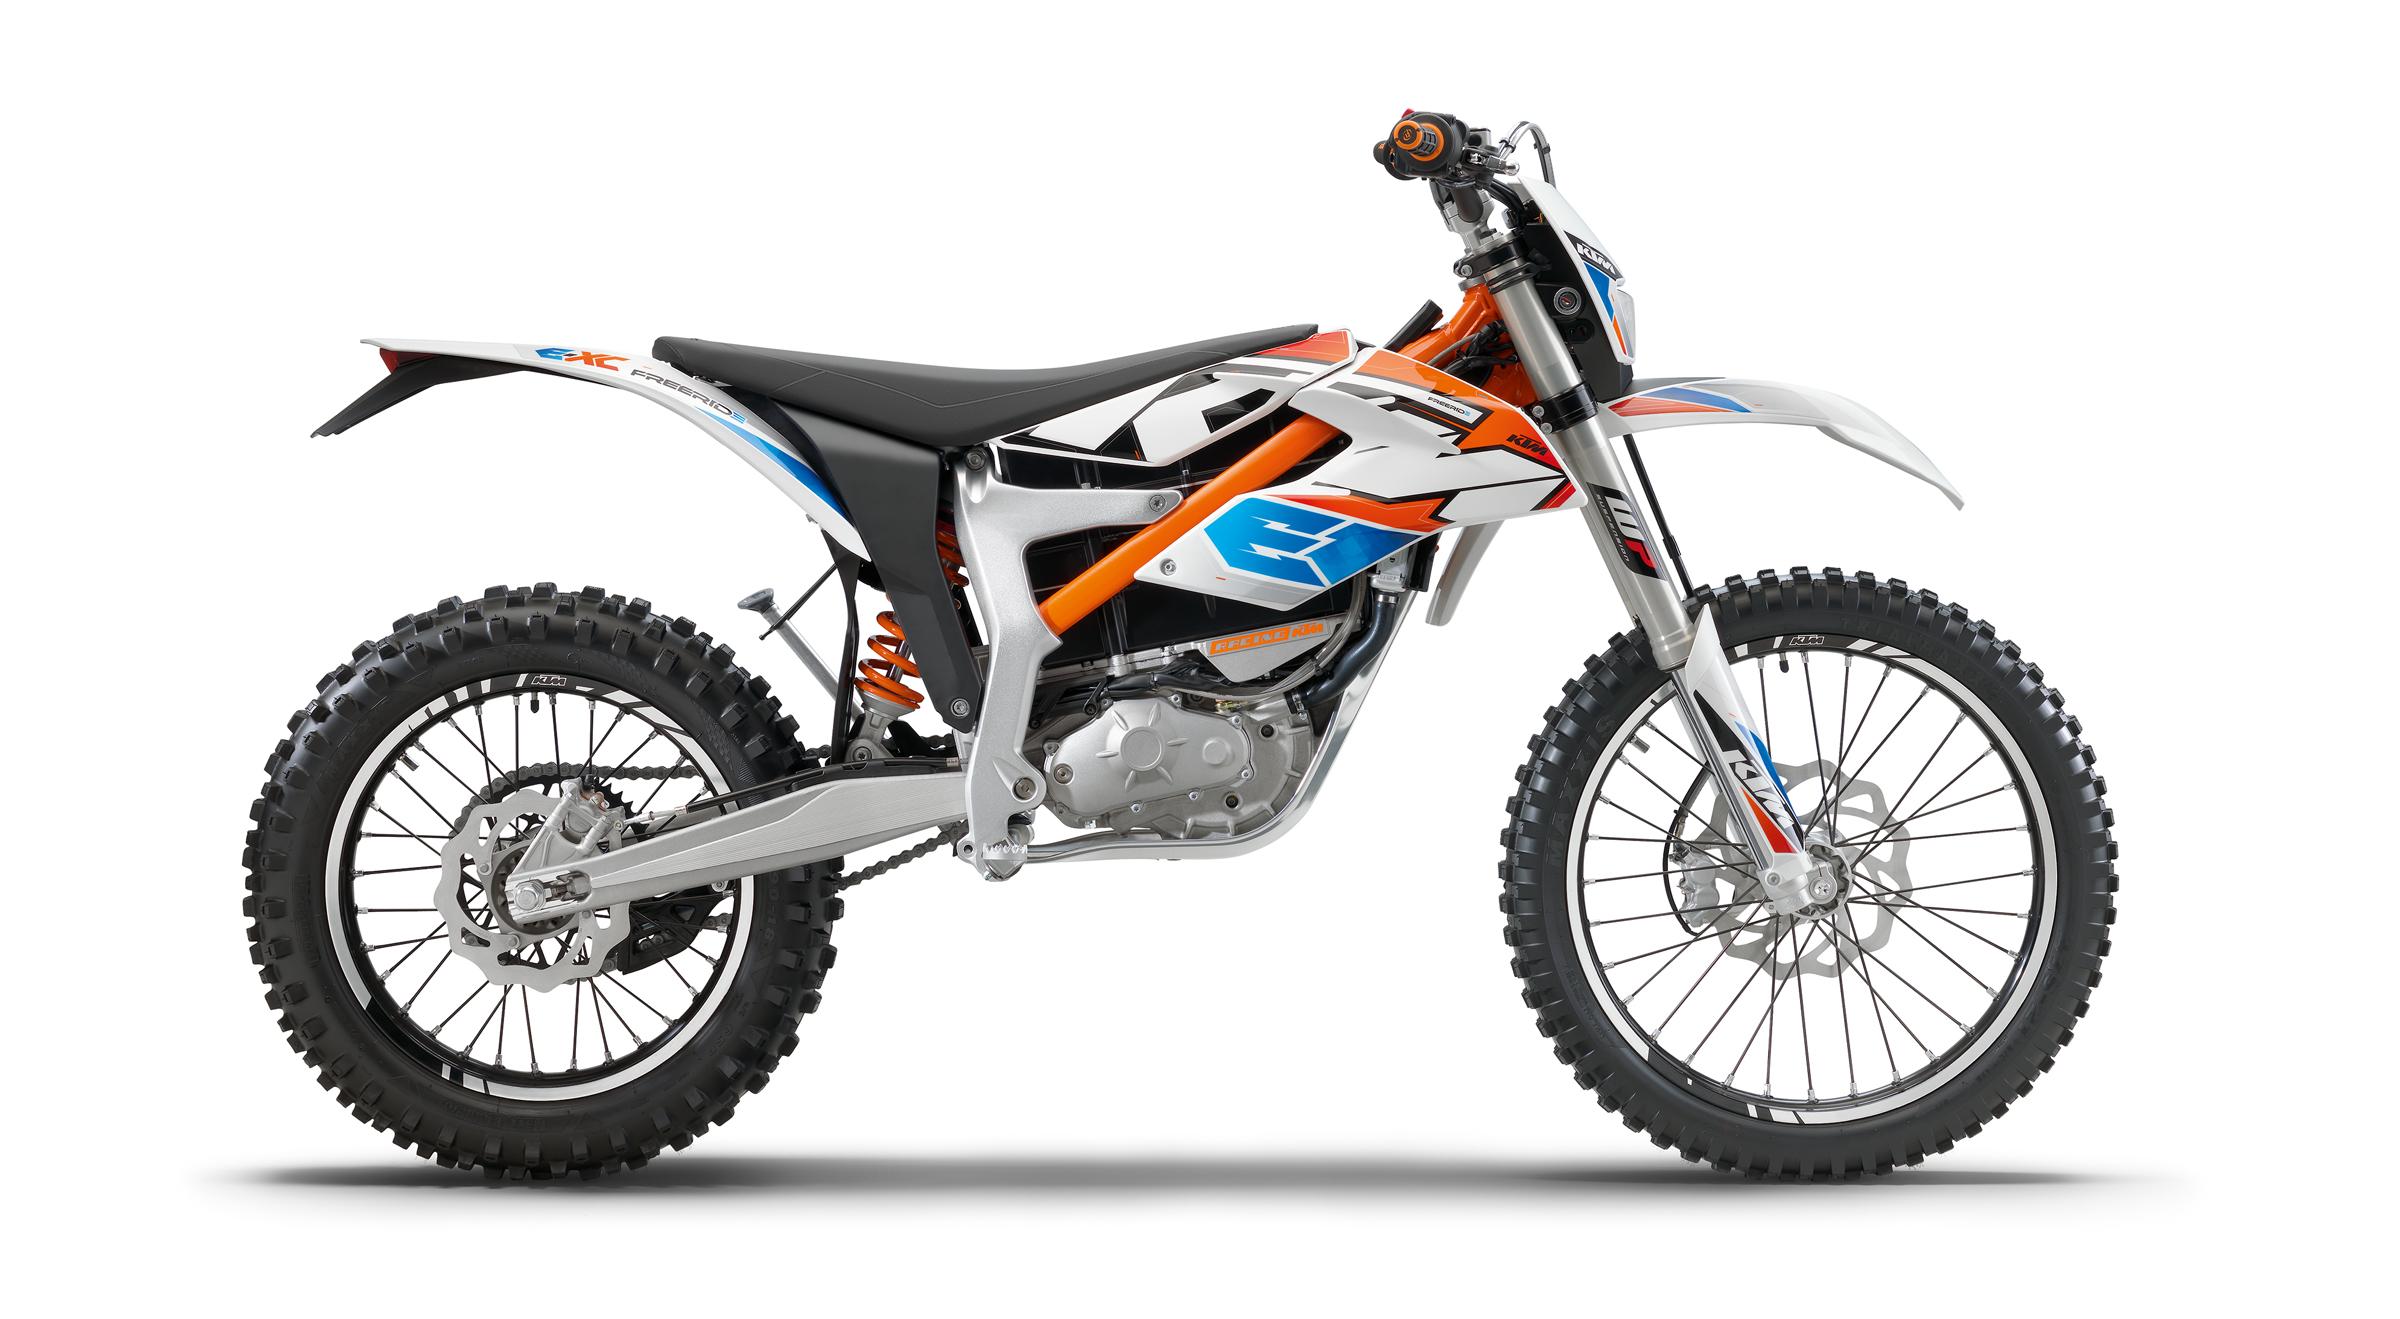 Ktm Freeride E Xc 90 Electric Motocross Motorcycle